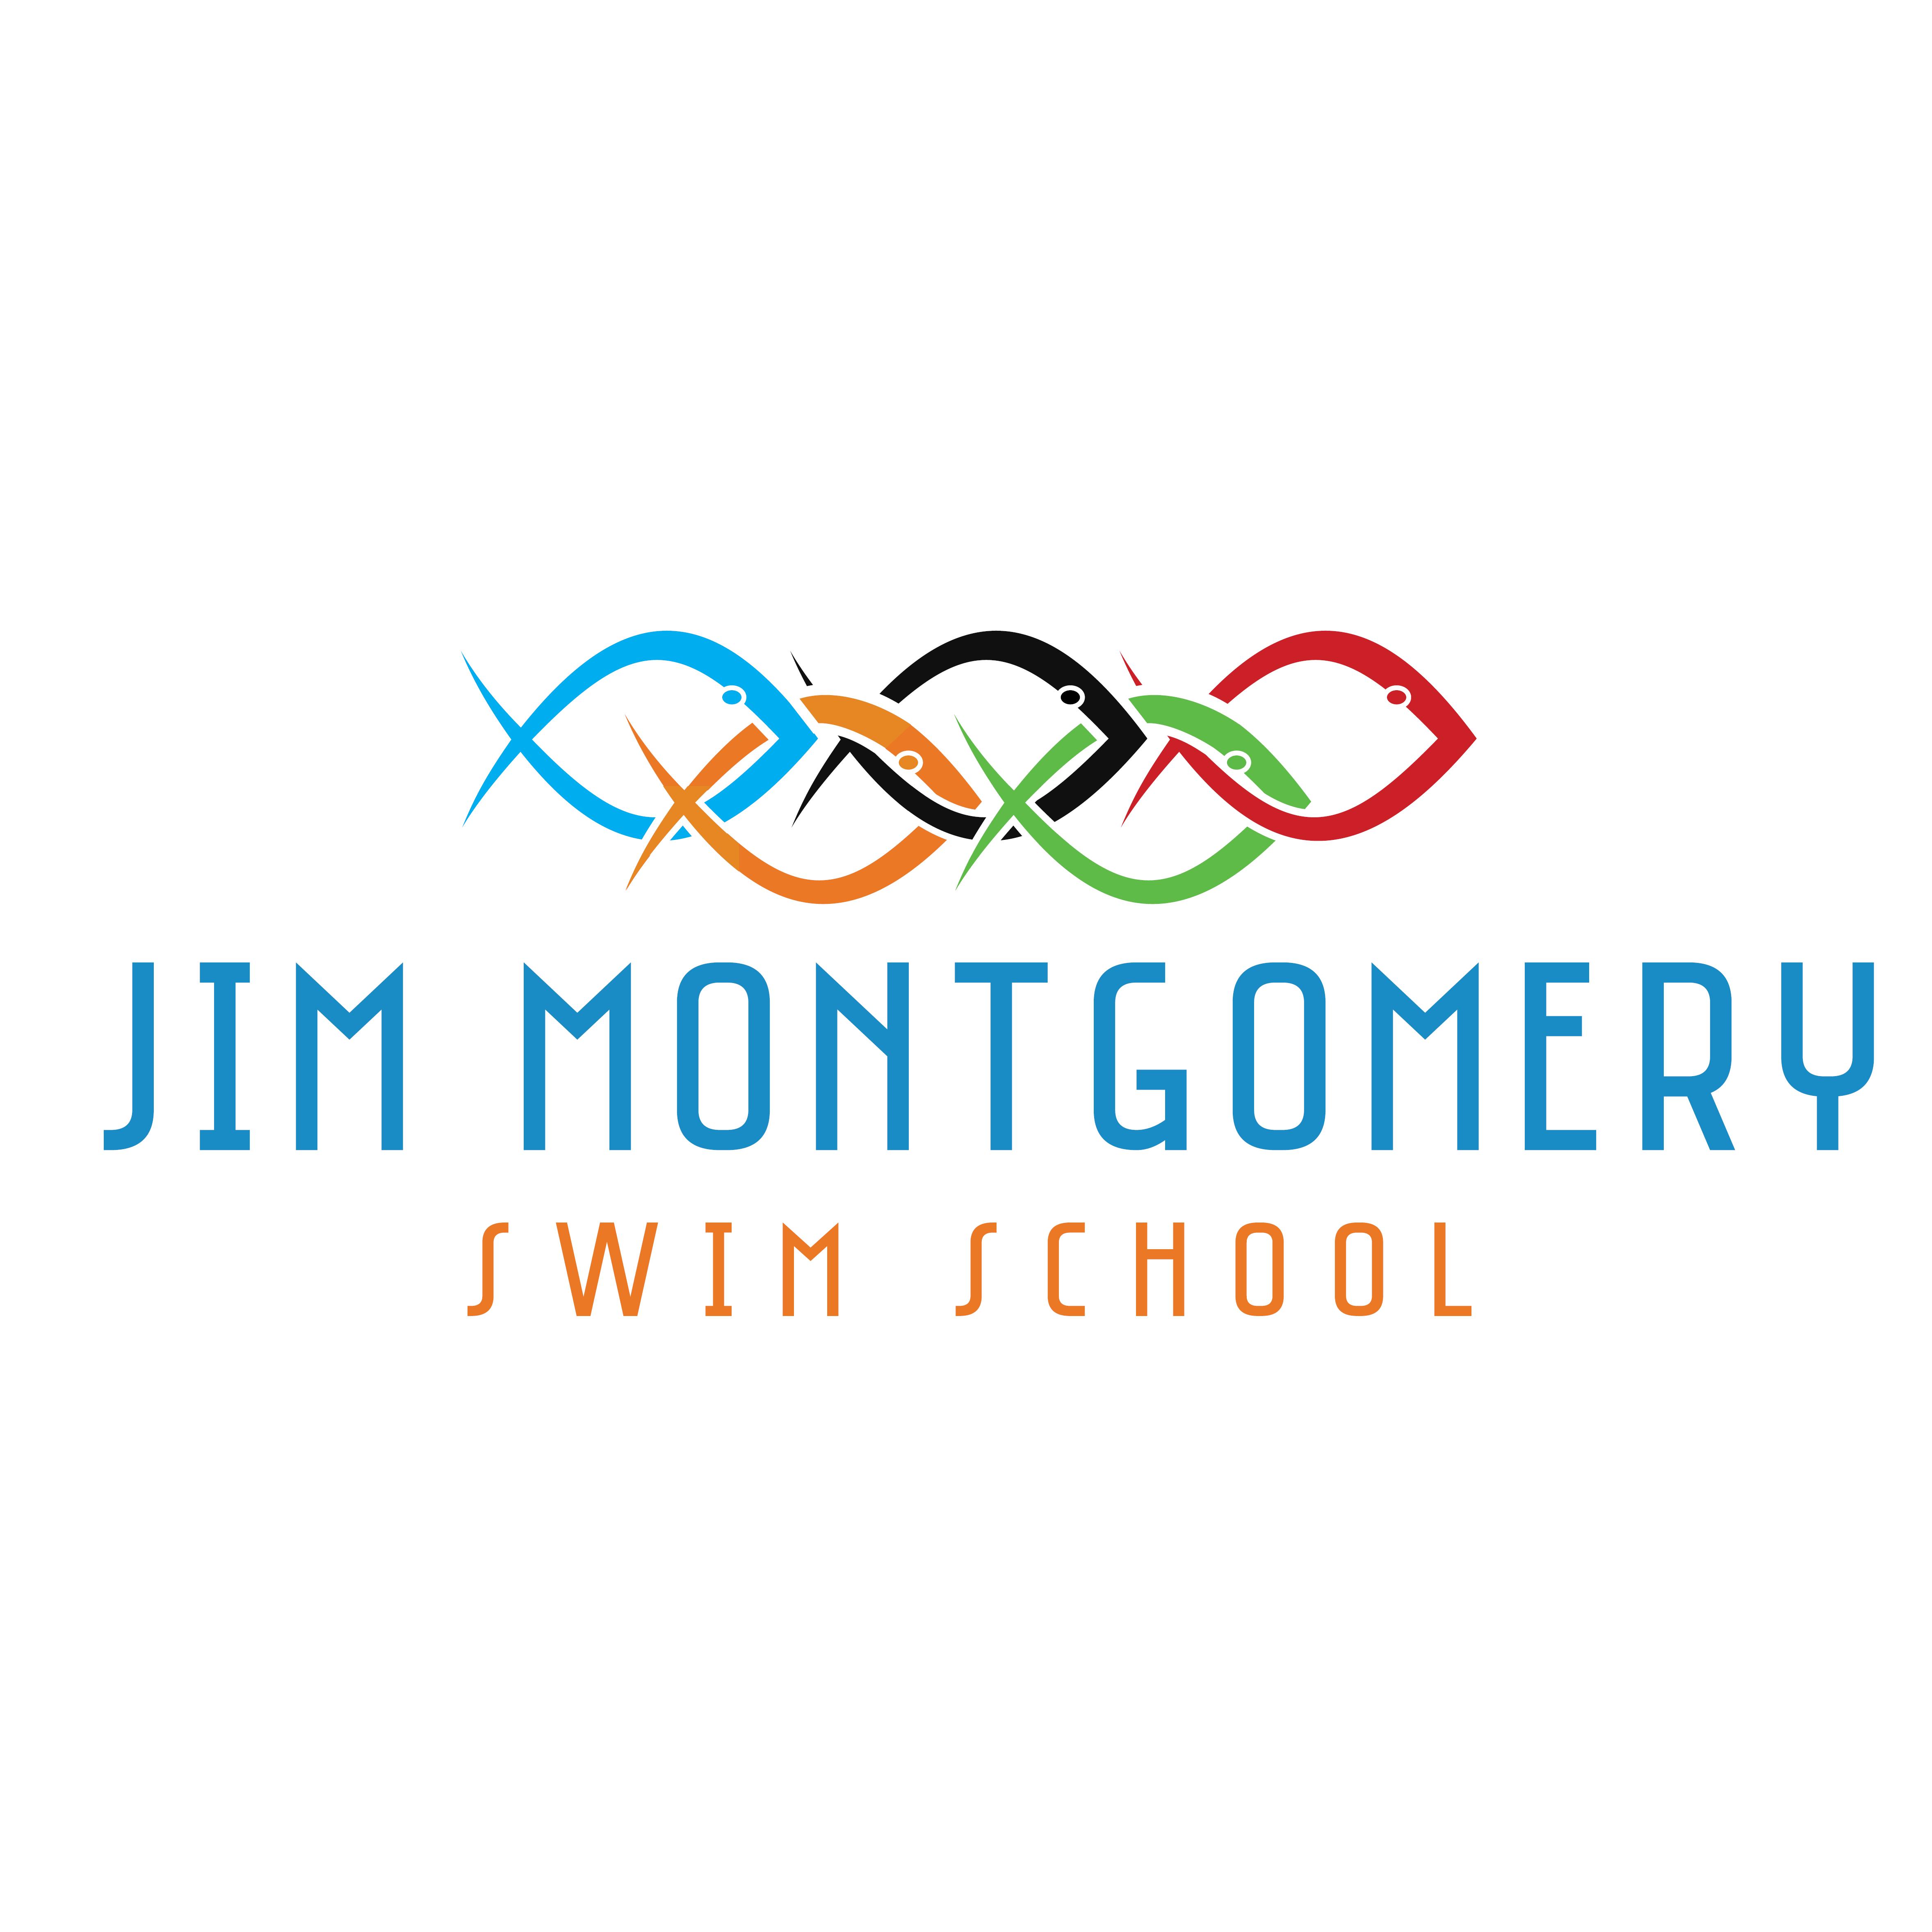 Jim Montgomery Swim School - Dallas, TX - Swimming